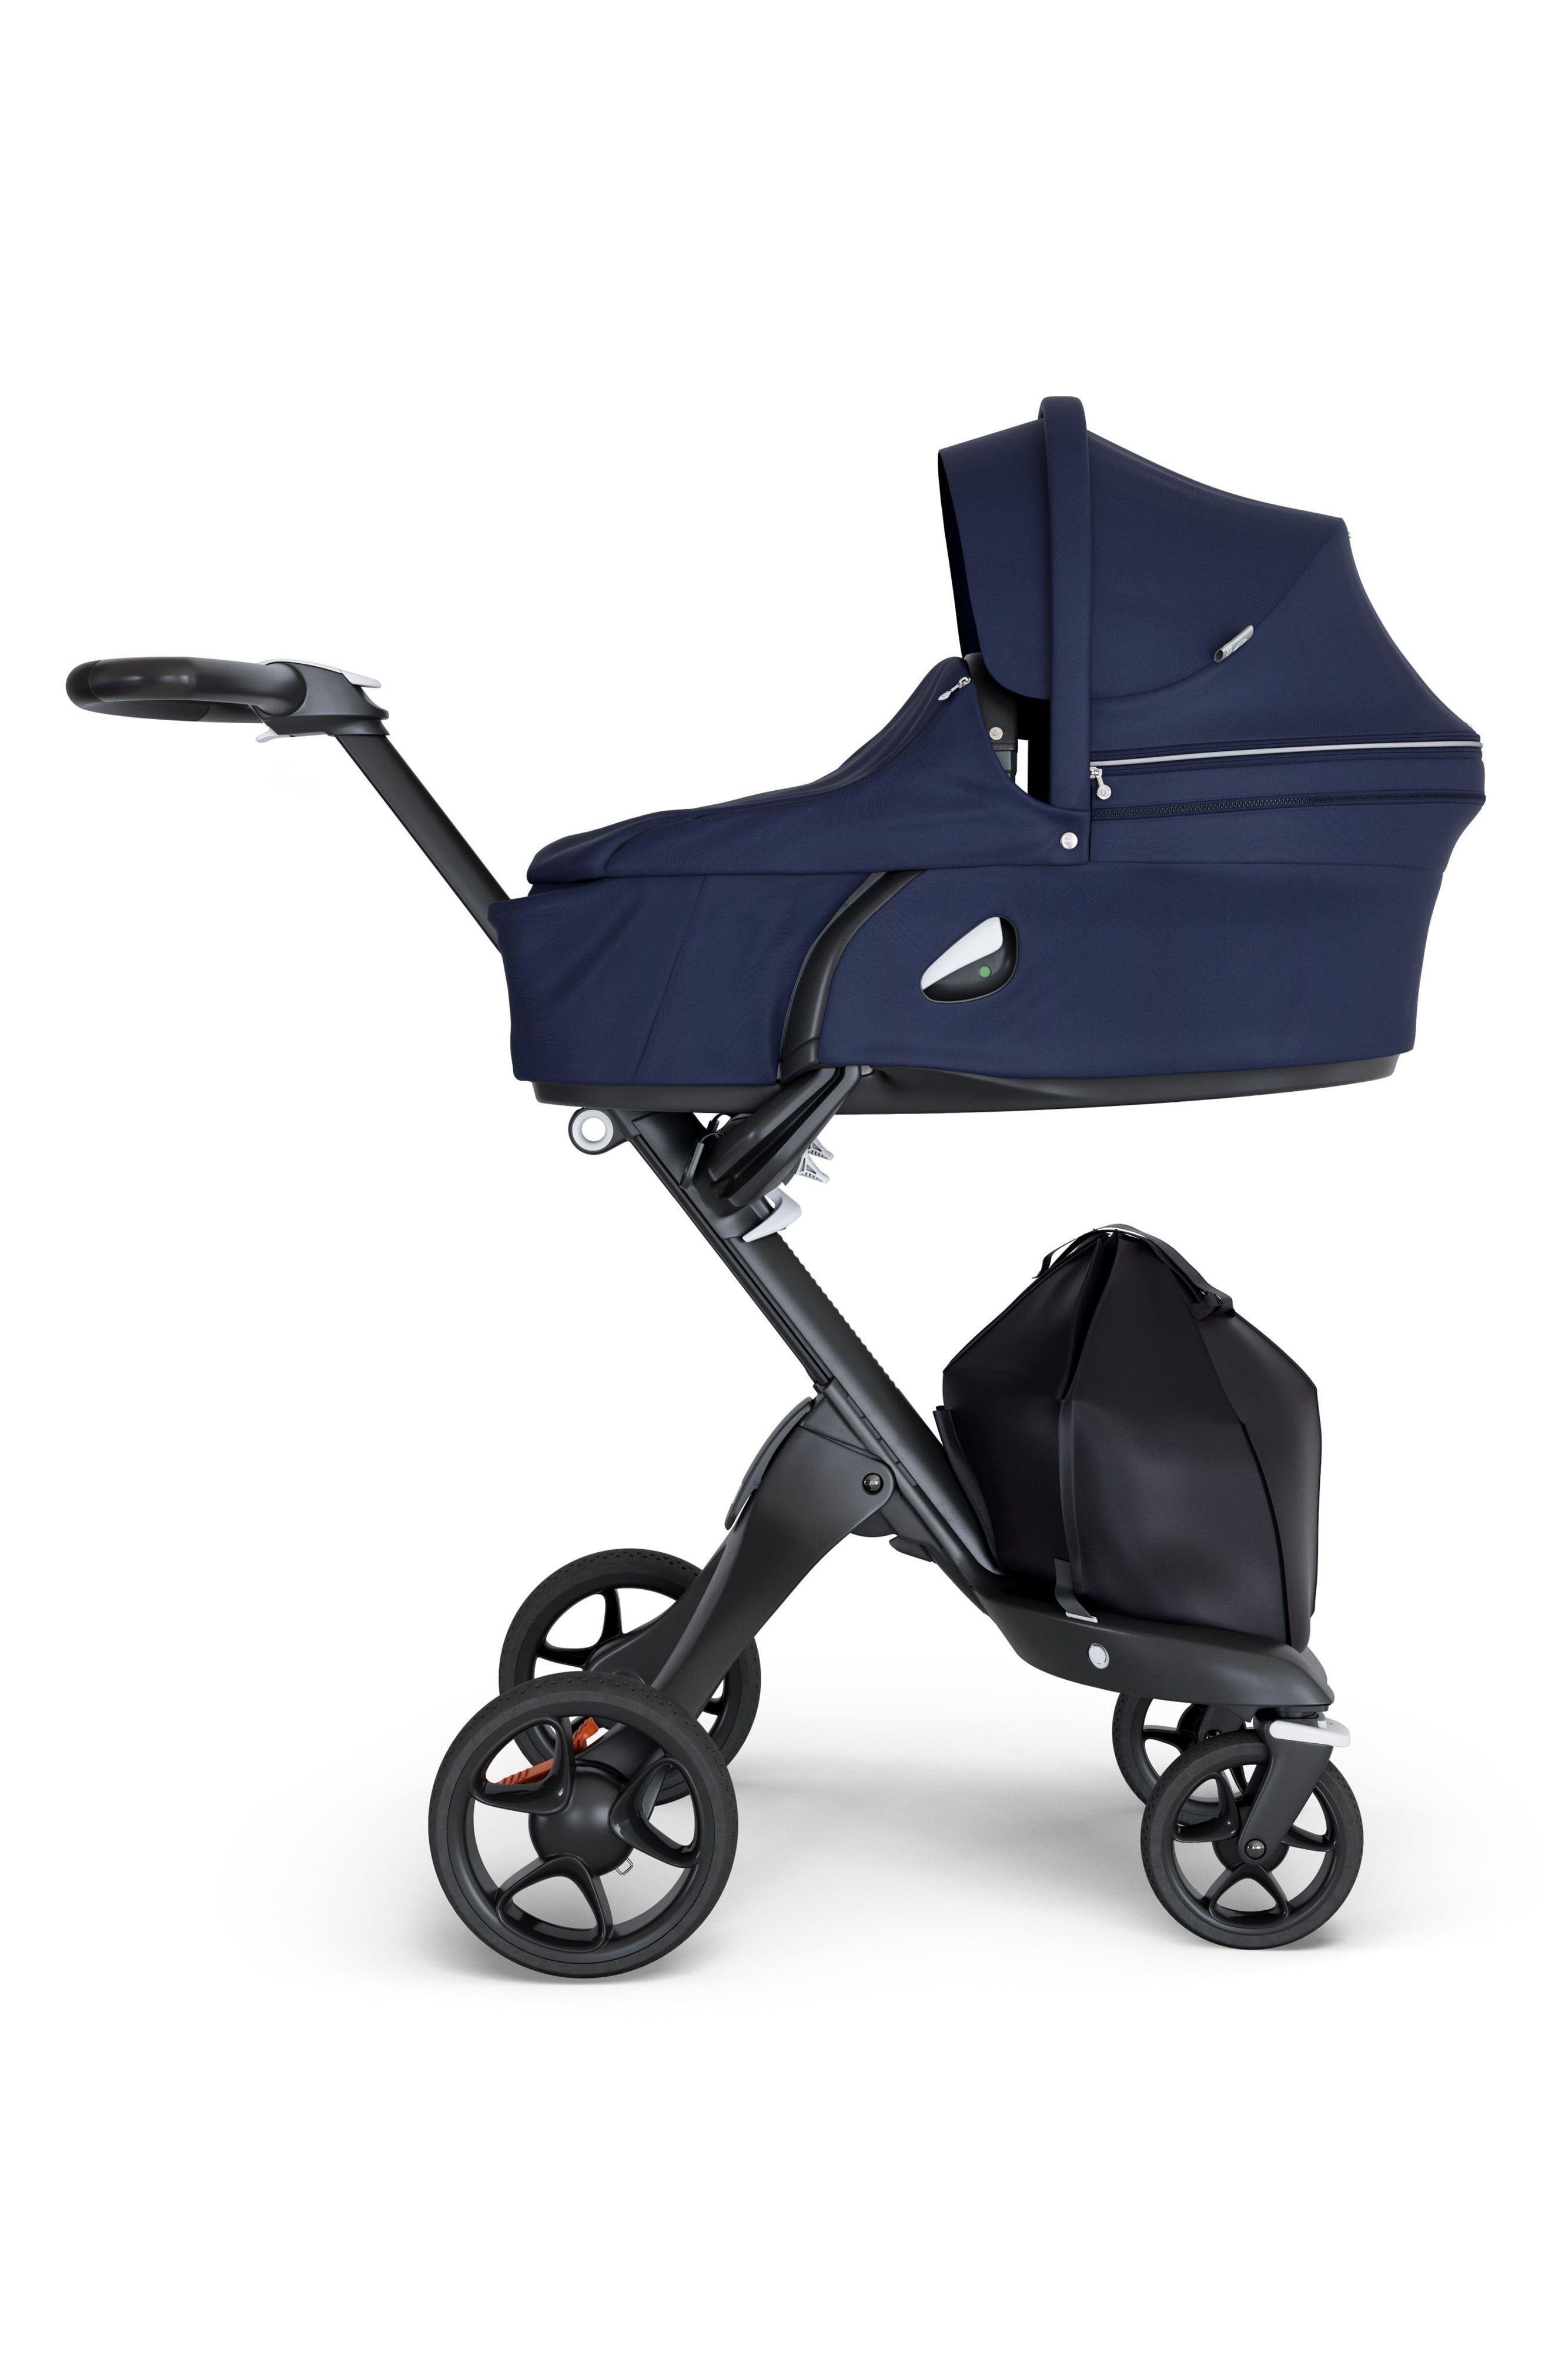 Stokke Xplory V6 Black Carry Cot Deep Blue